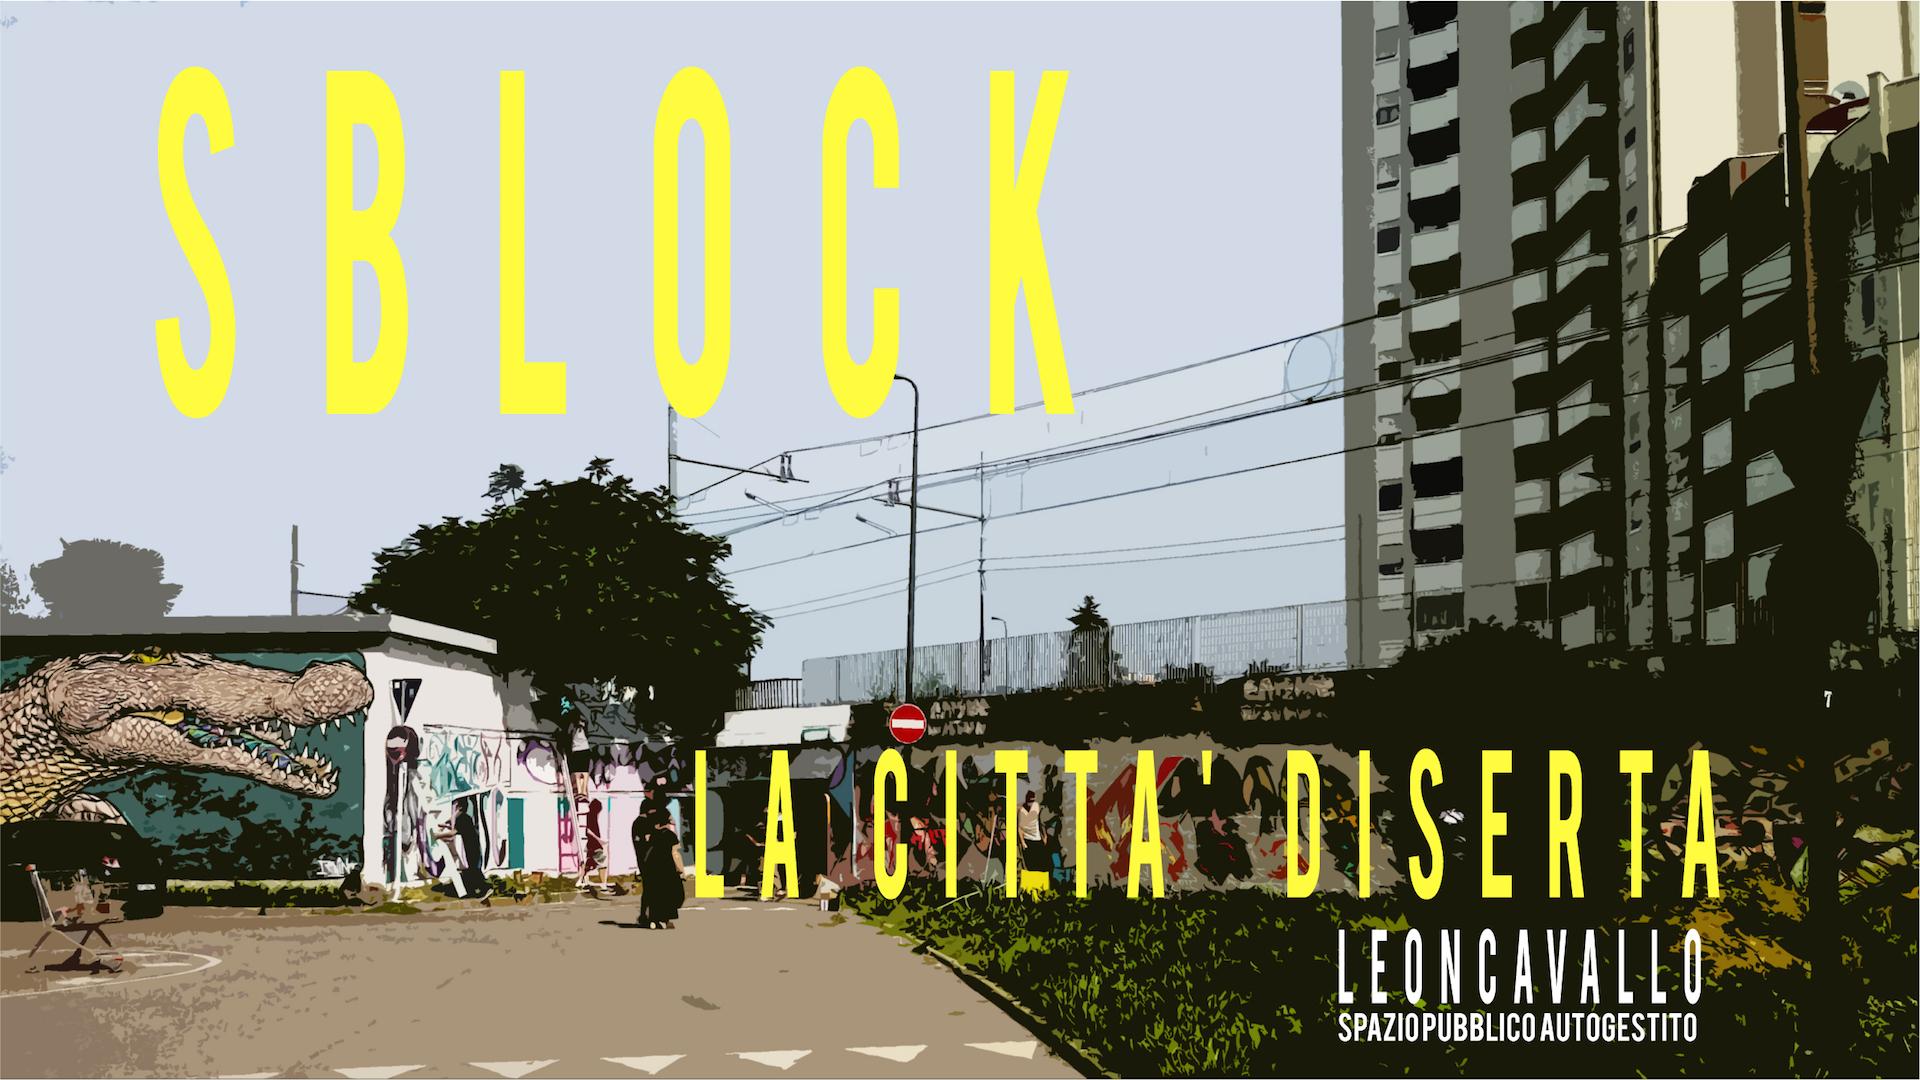 SBLOCK! - LA CITTÀ DISERTA